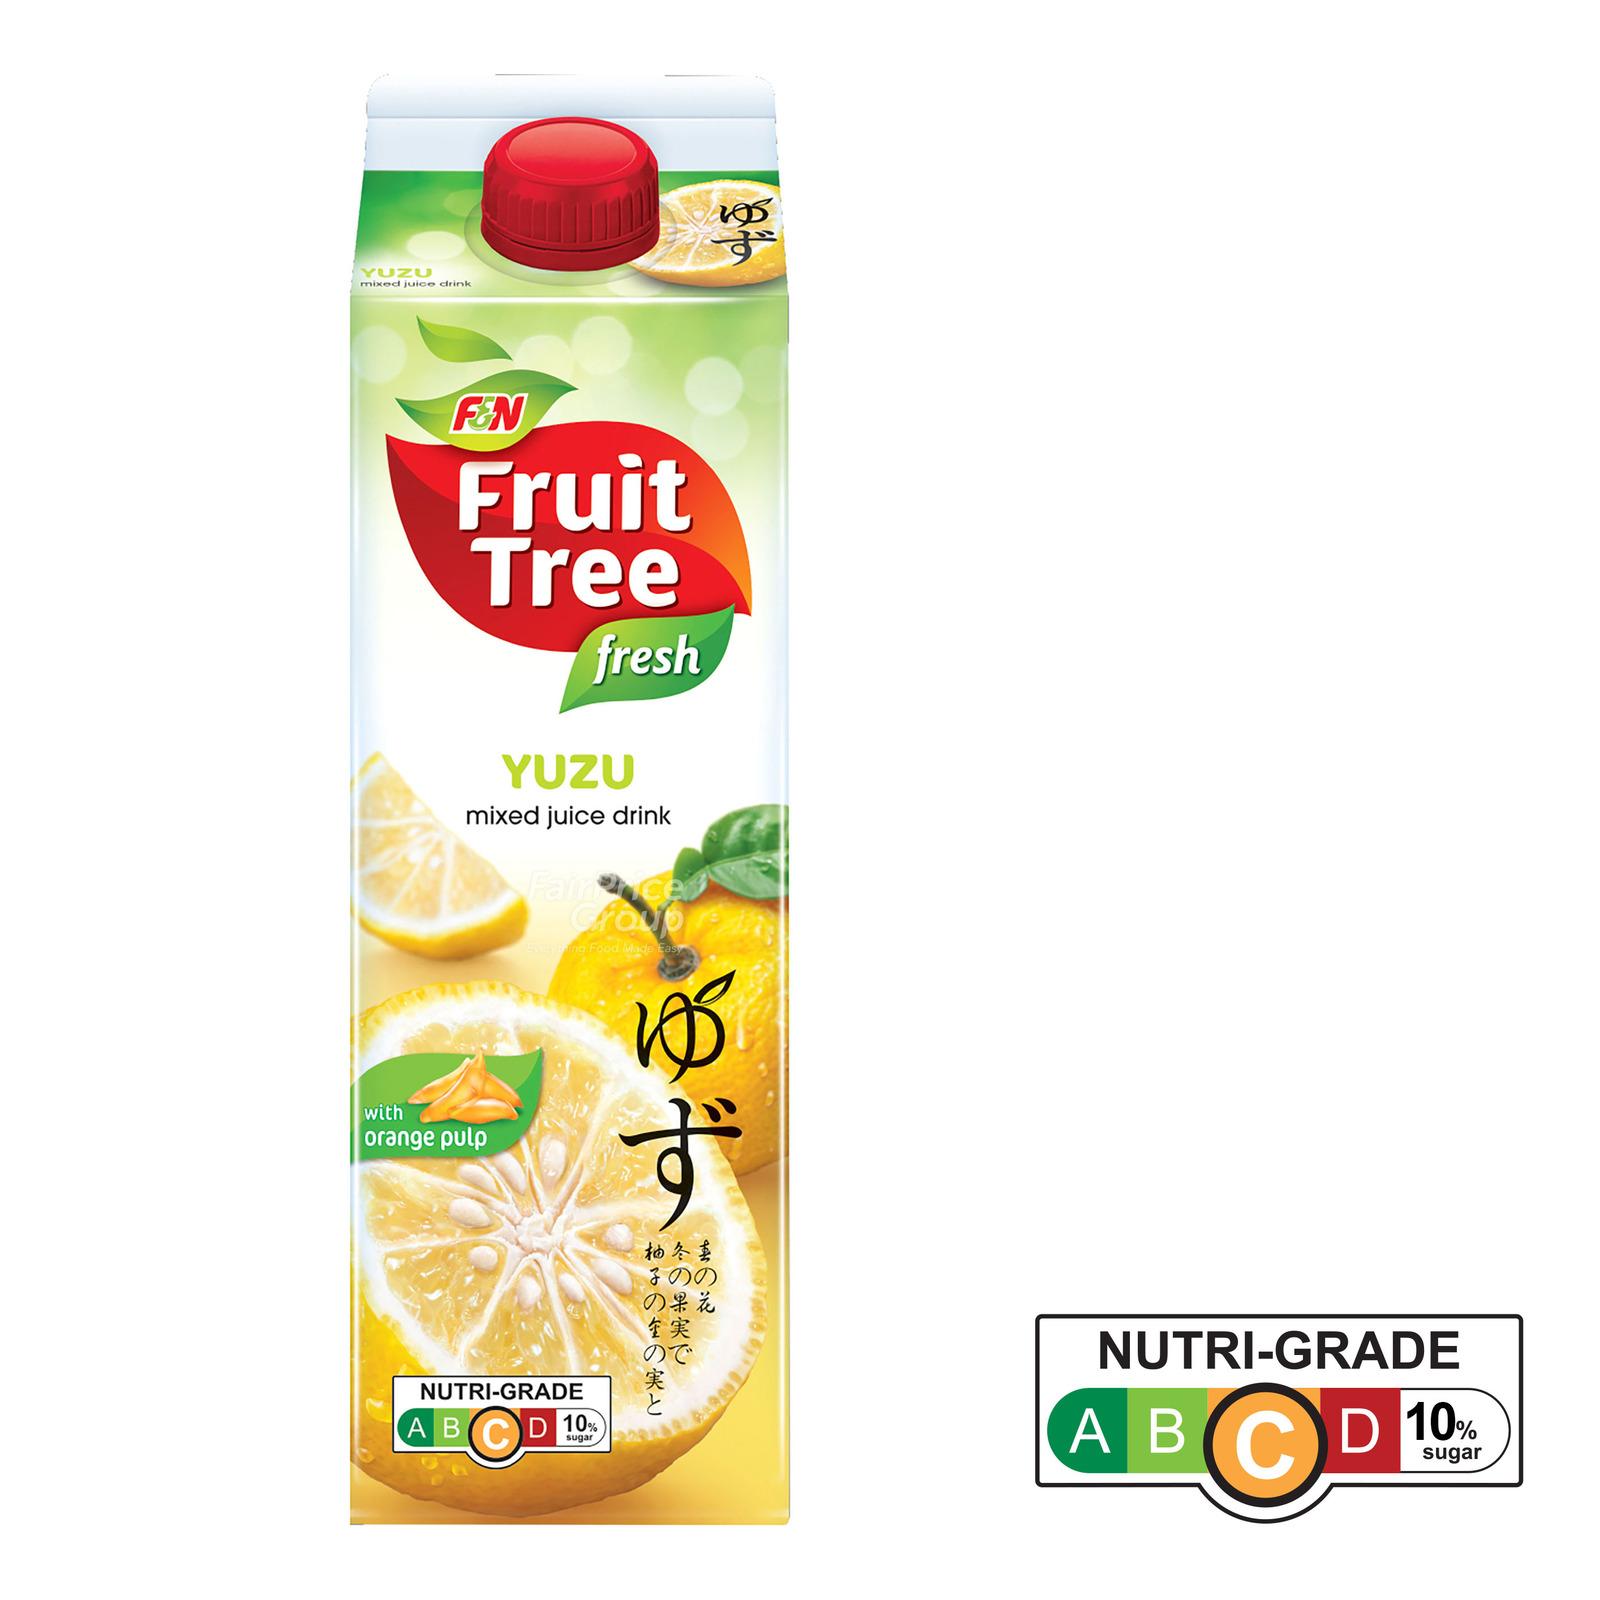 F&N Fruit Tree Fresh Juice - Yuzu with Orange Pulp